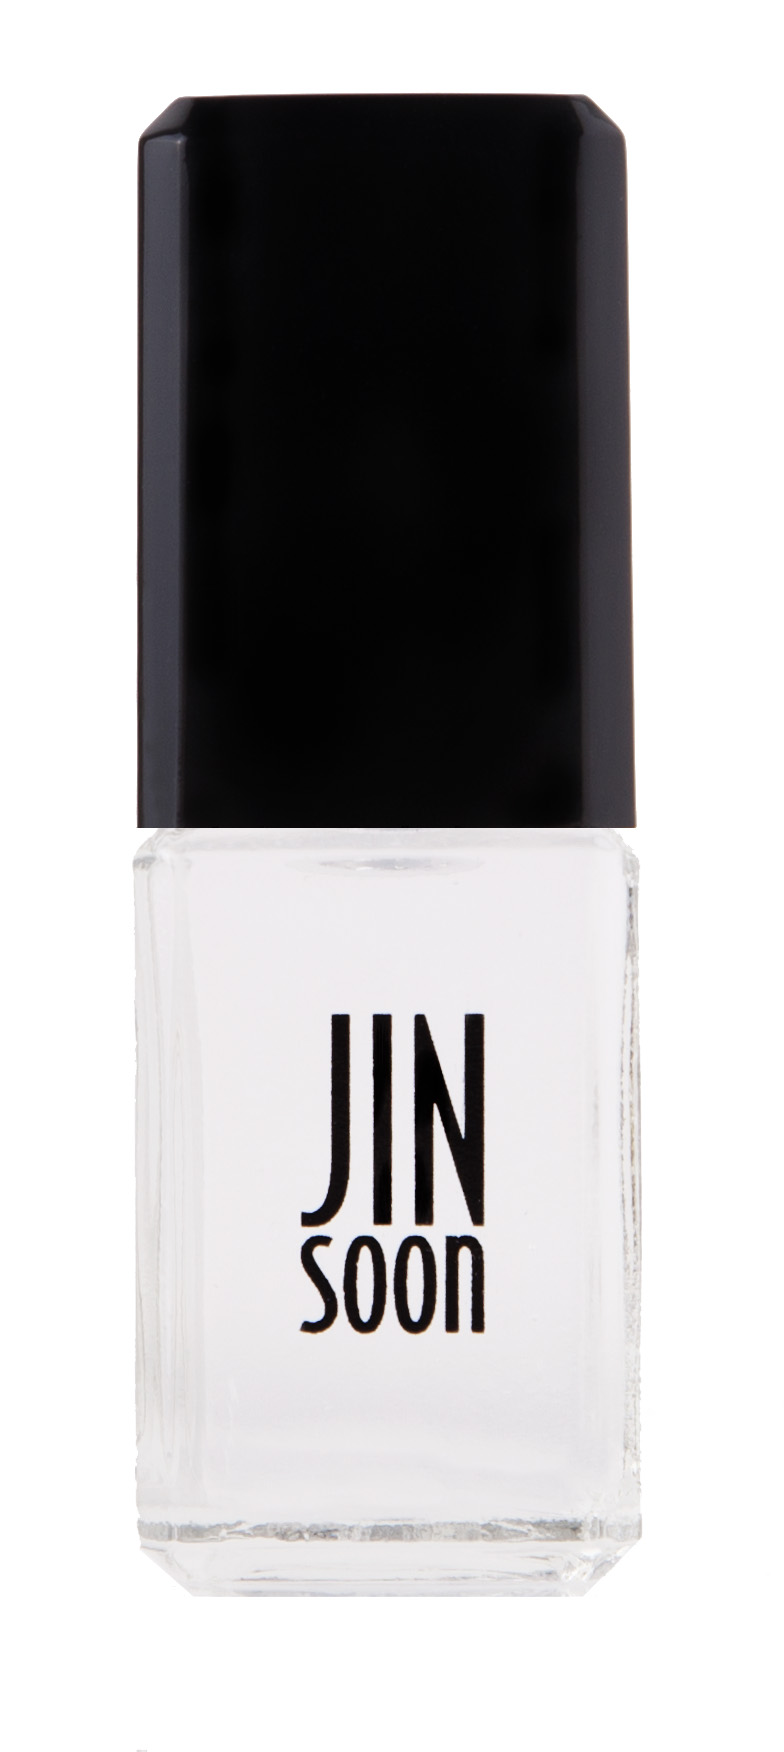 JINsoon Top Gloss ($18)